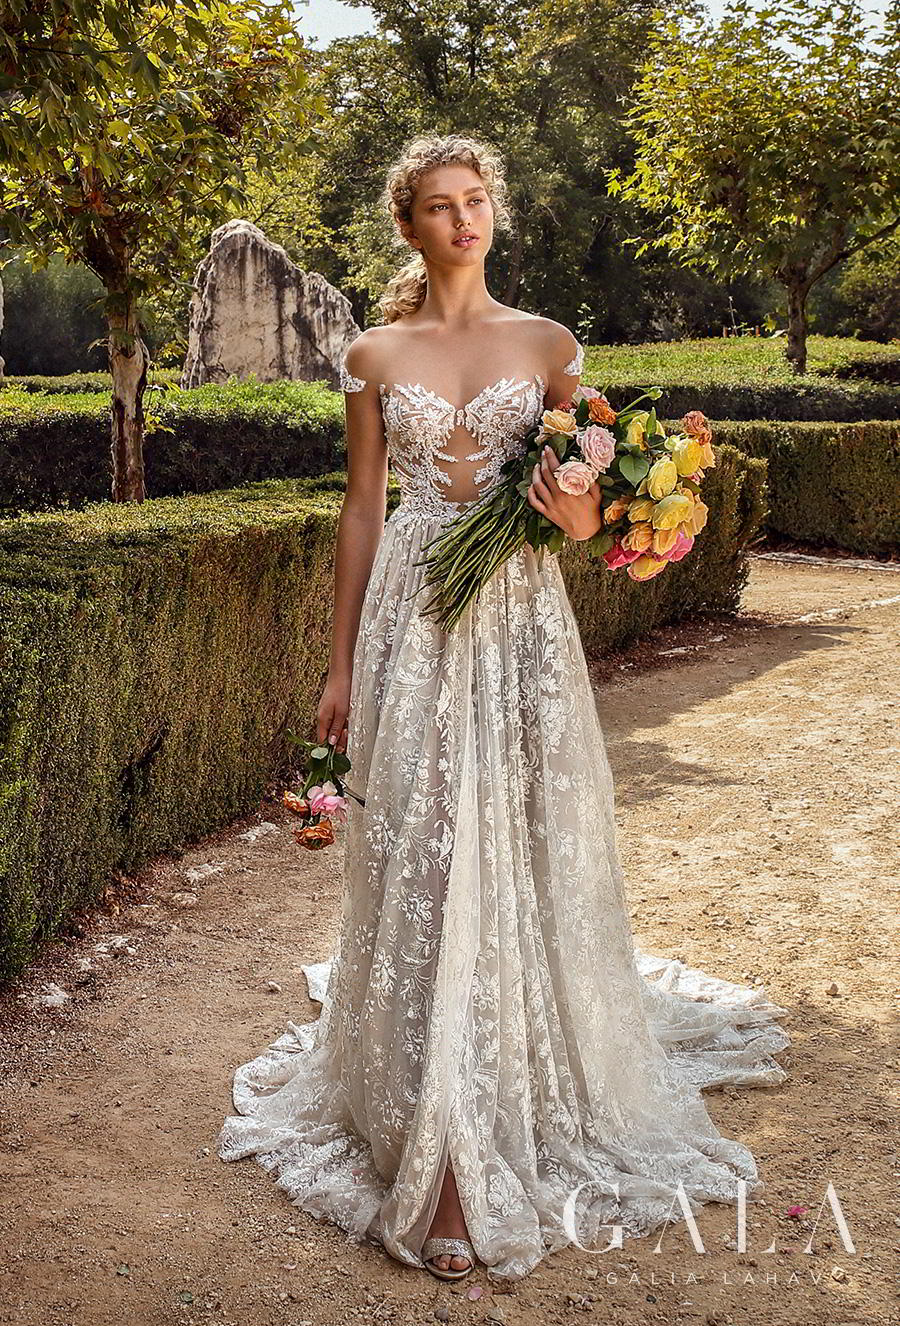 Fairytale Wedding Dress